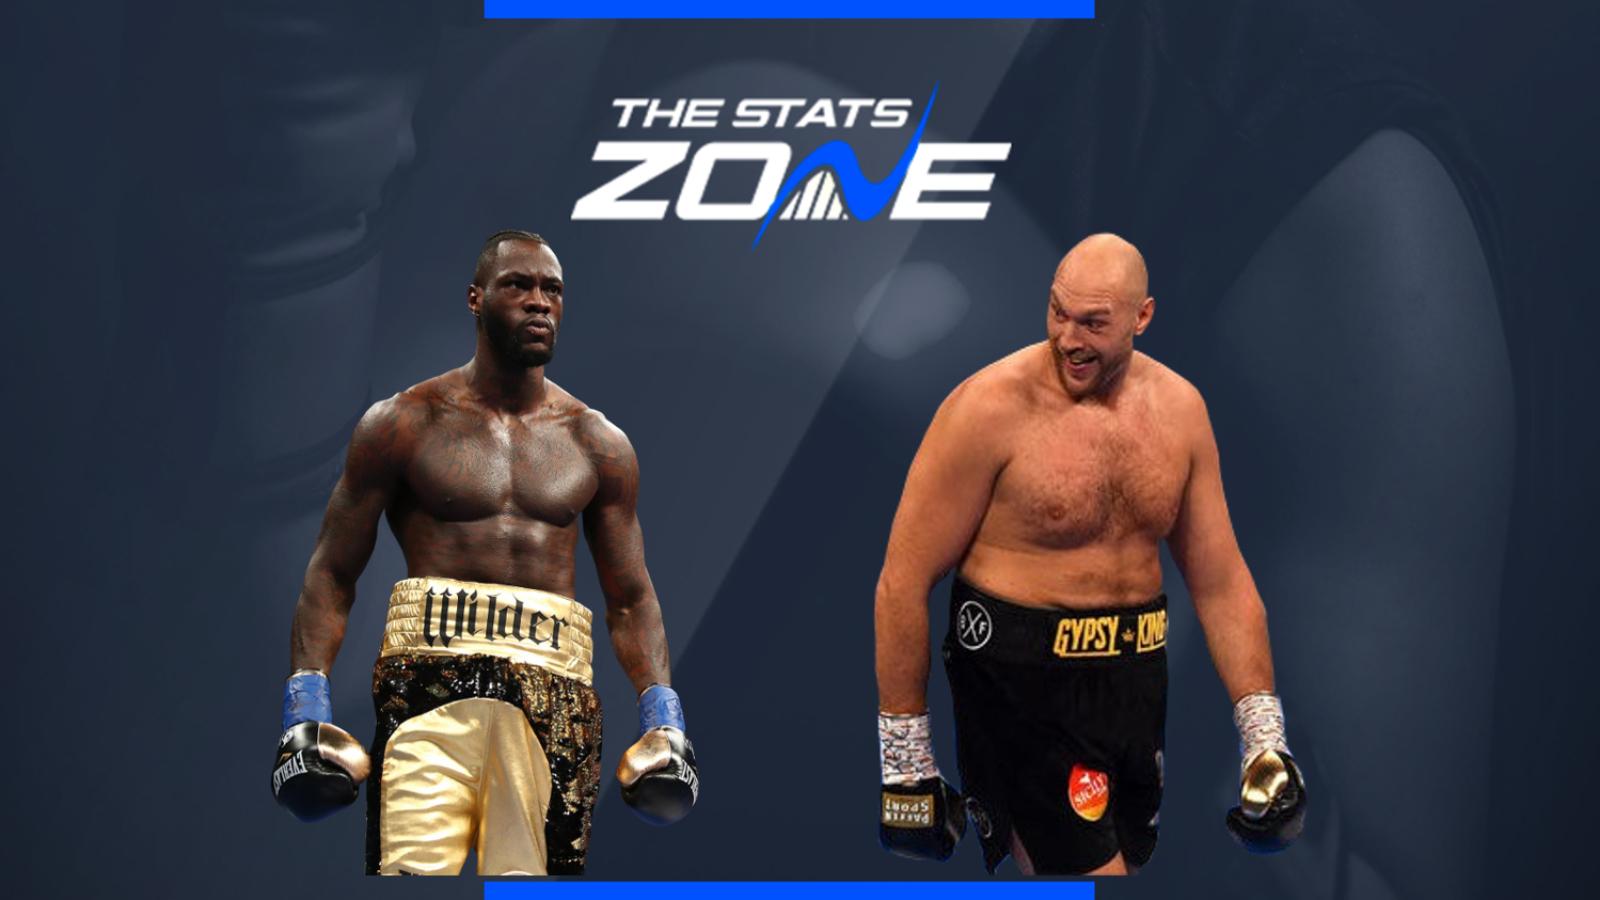 Fury Wilder 2 Weight : Deontay Wilder Vs Tyson Fury 2 Breakdown Prediction The Stats Zone